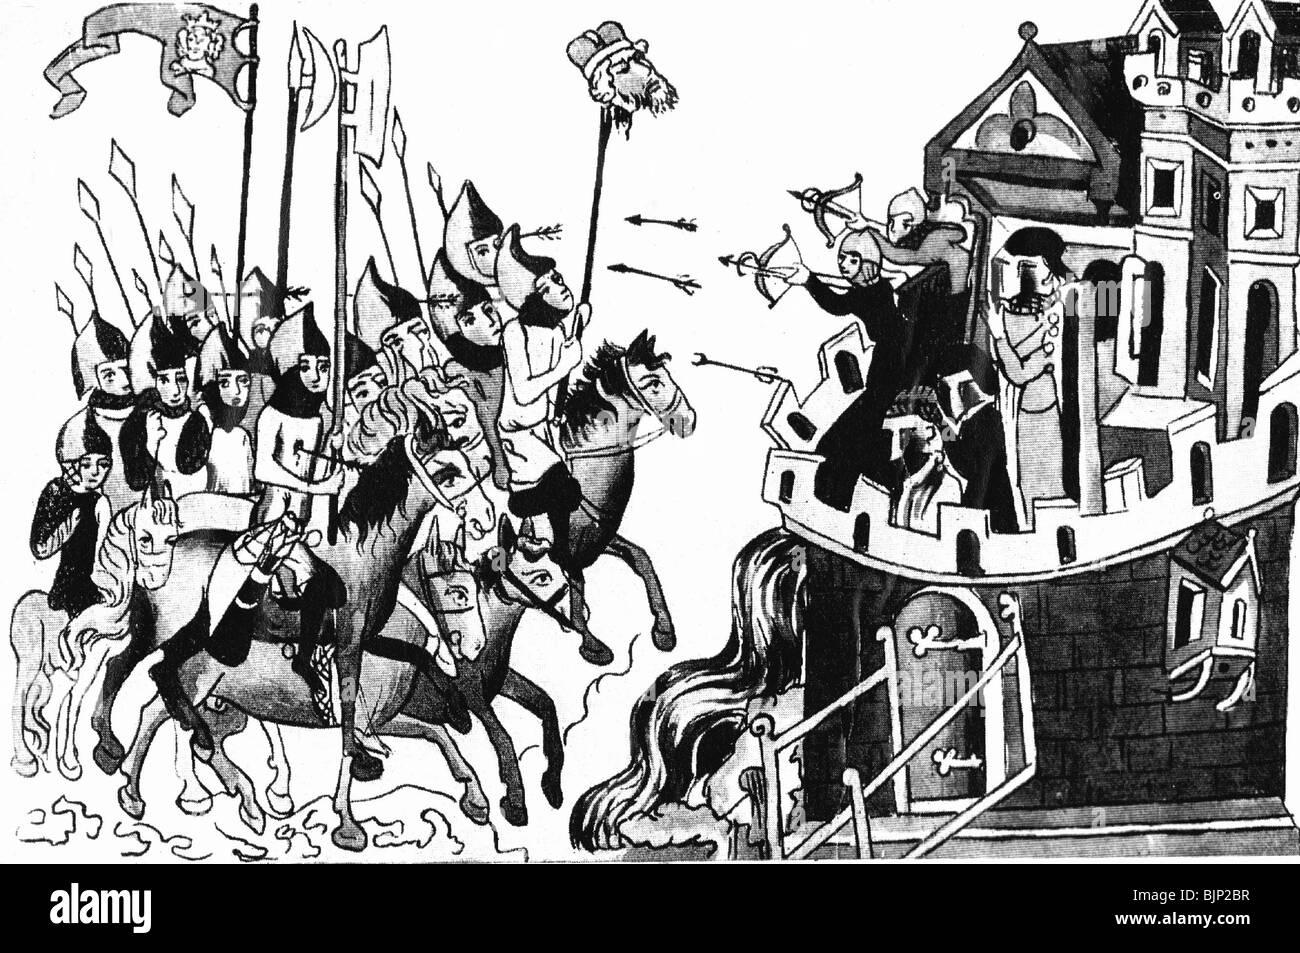 Mongol invasions of Europe 1237 - 1262, Battle of Legnica, 9.4.1241,  miniature, Jadwiga legend, Schlackenwerth Monastery, 1353, Poland, Silesia,  Mongols, ...